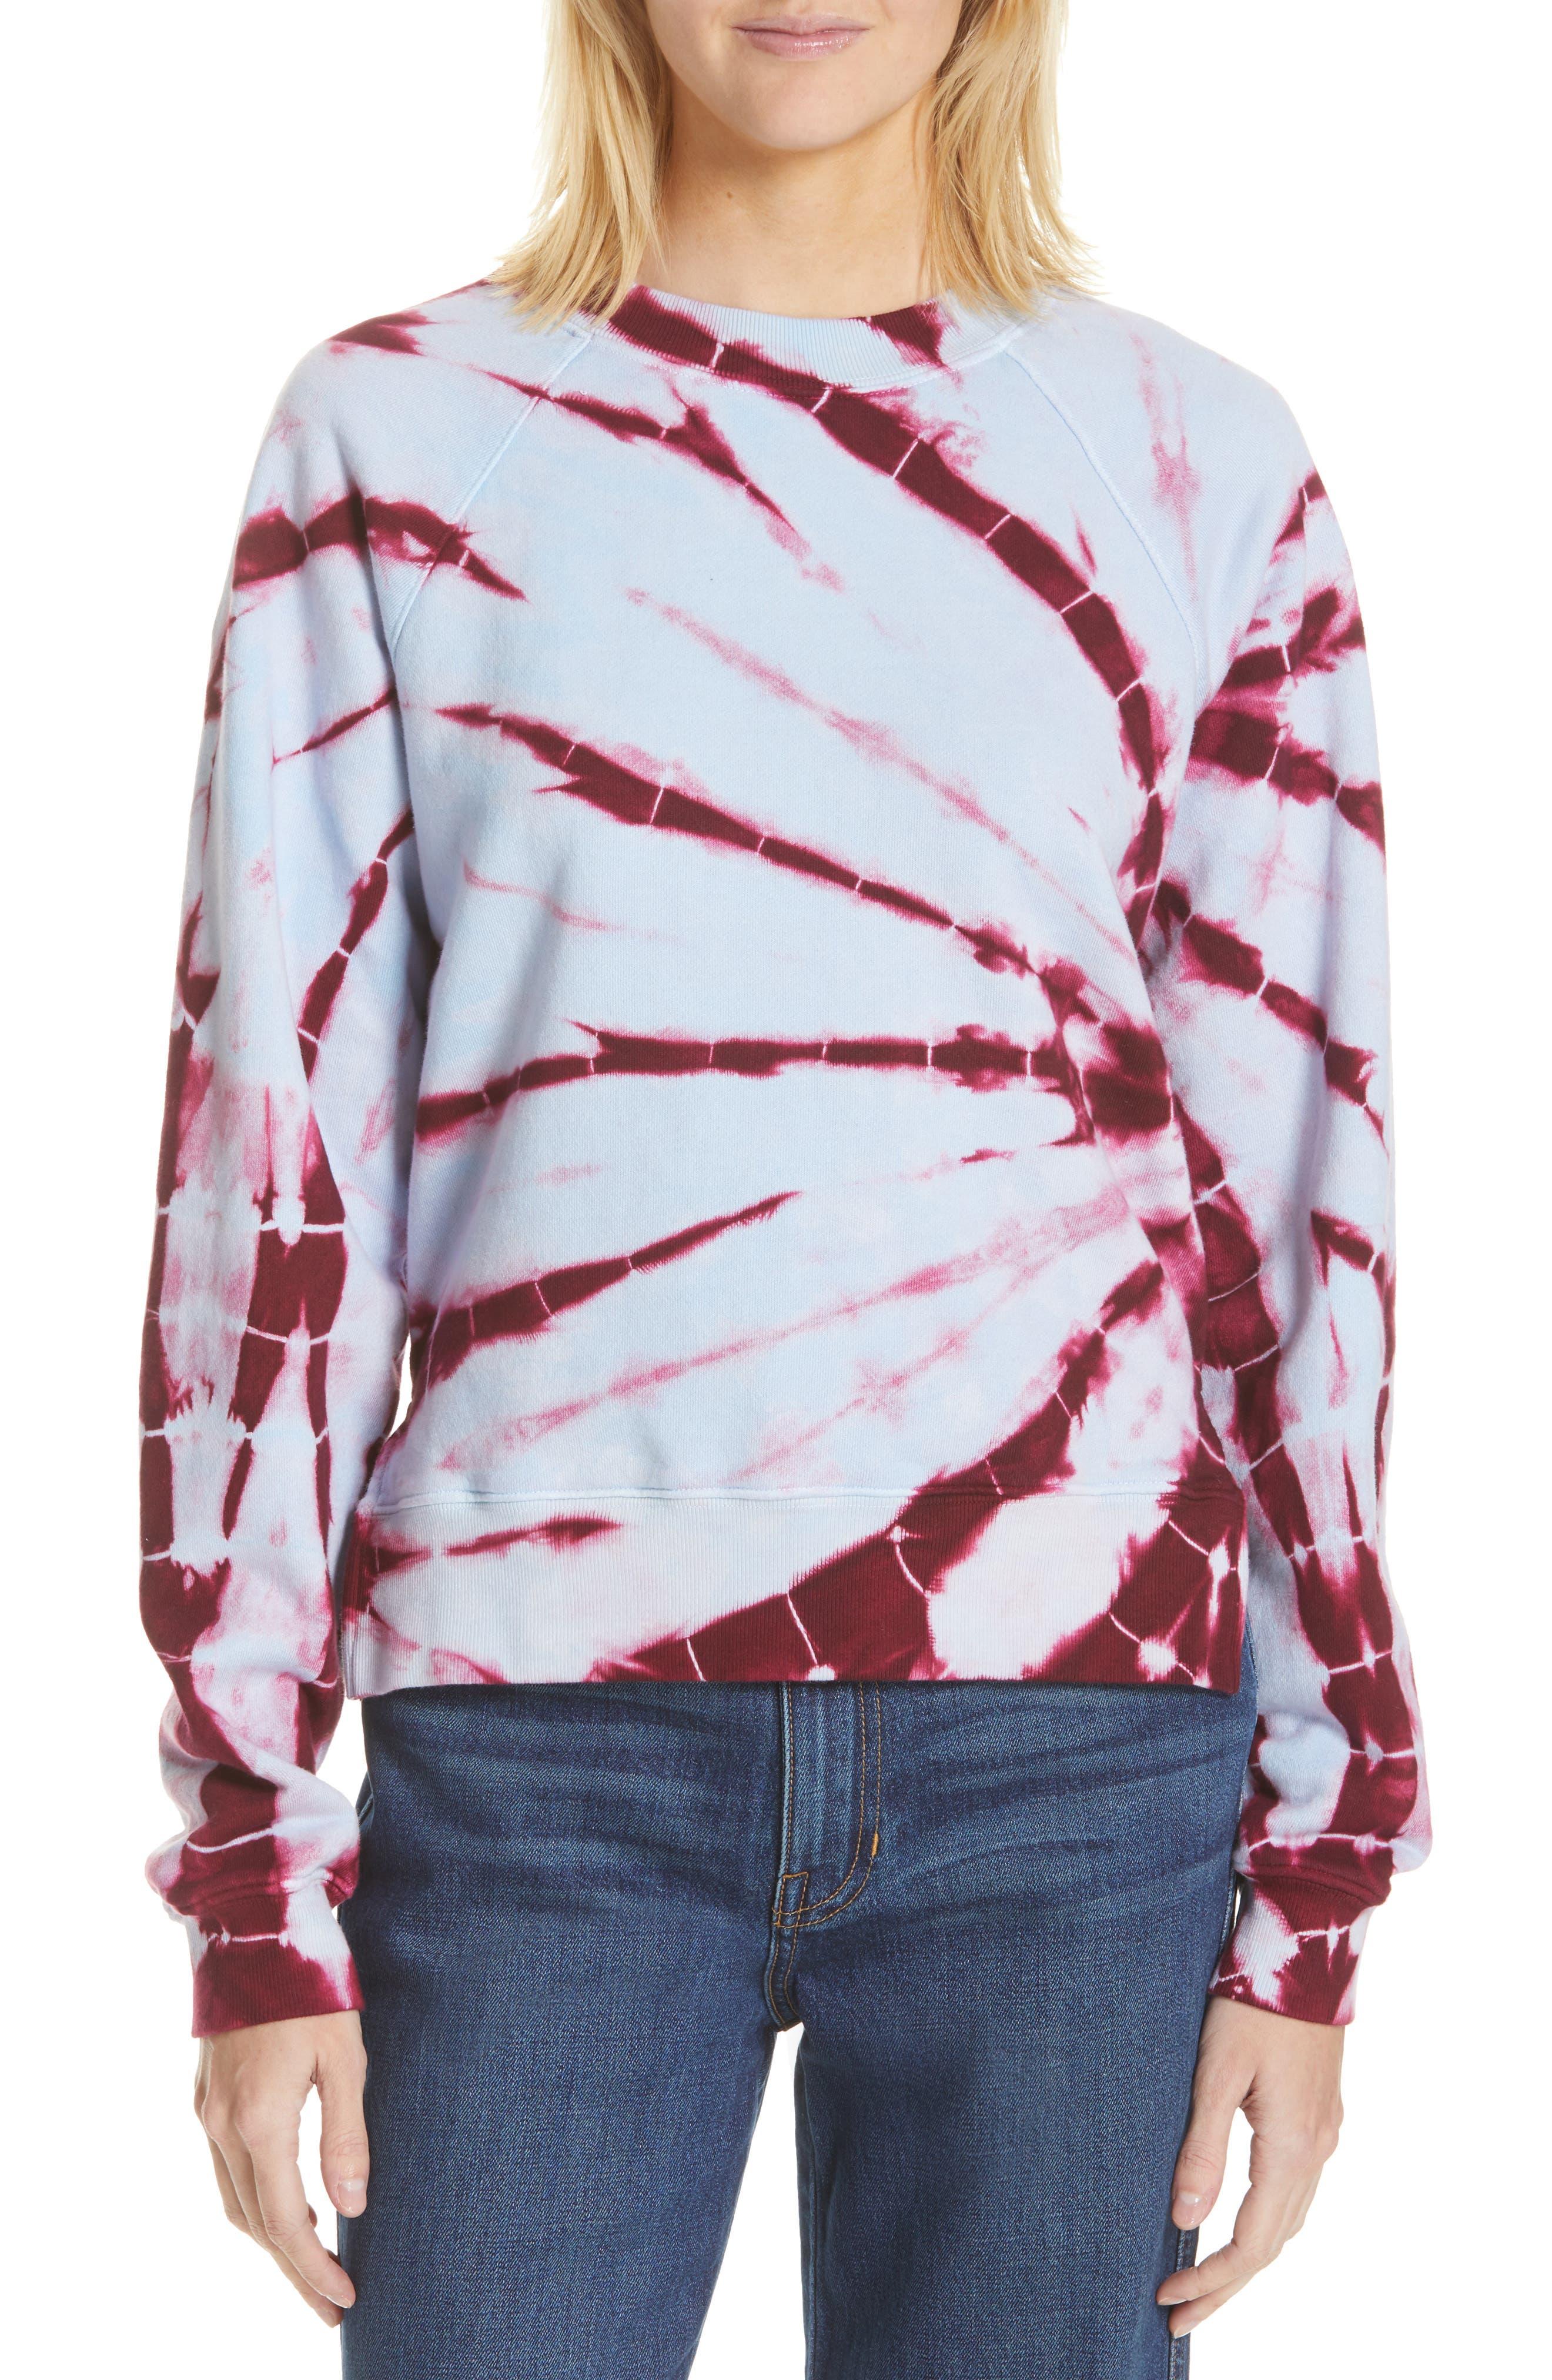 PROENZA SCHOULER PSWL Tie Dye Sweatshirt, Main, color, BABY BLUE/ RED TIE DYE